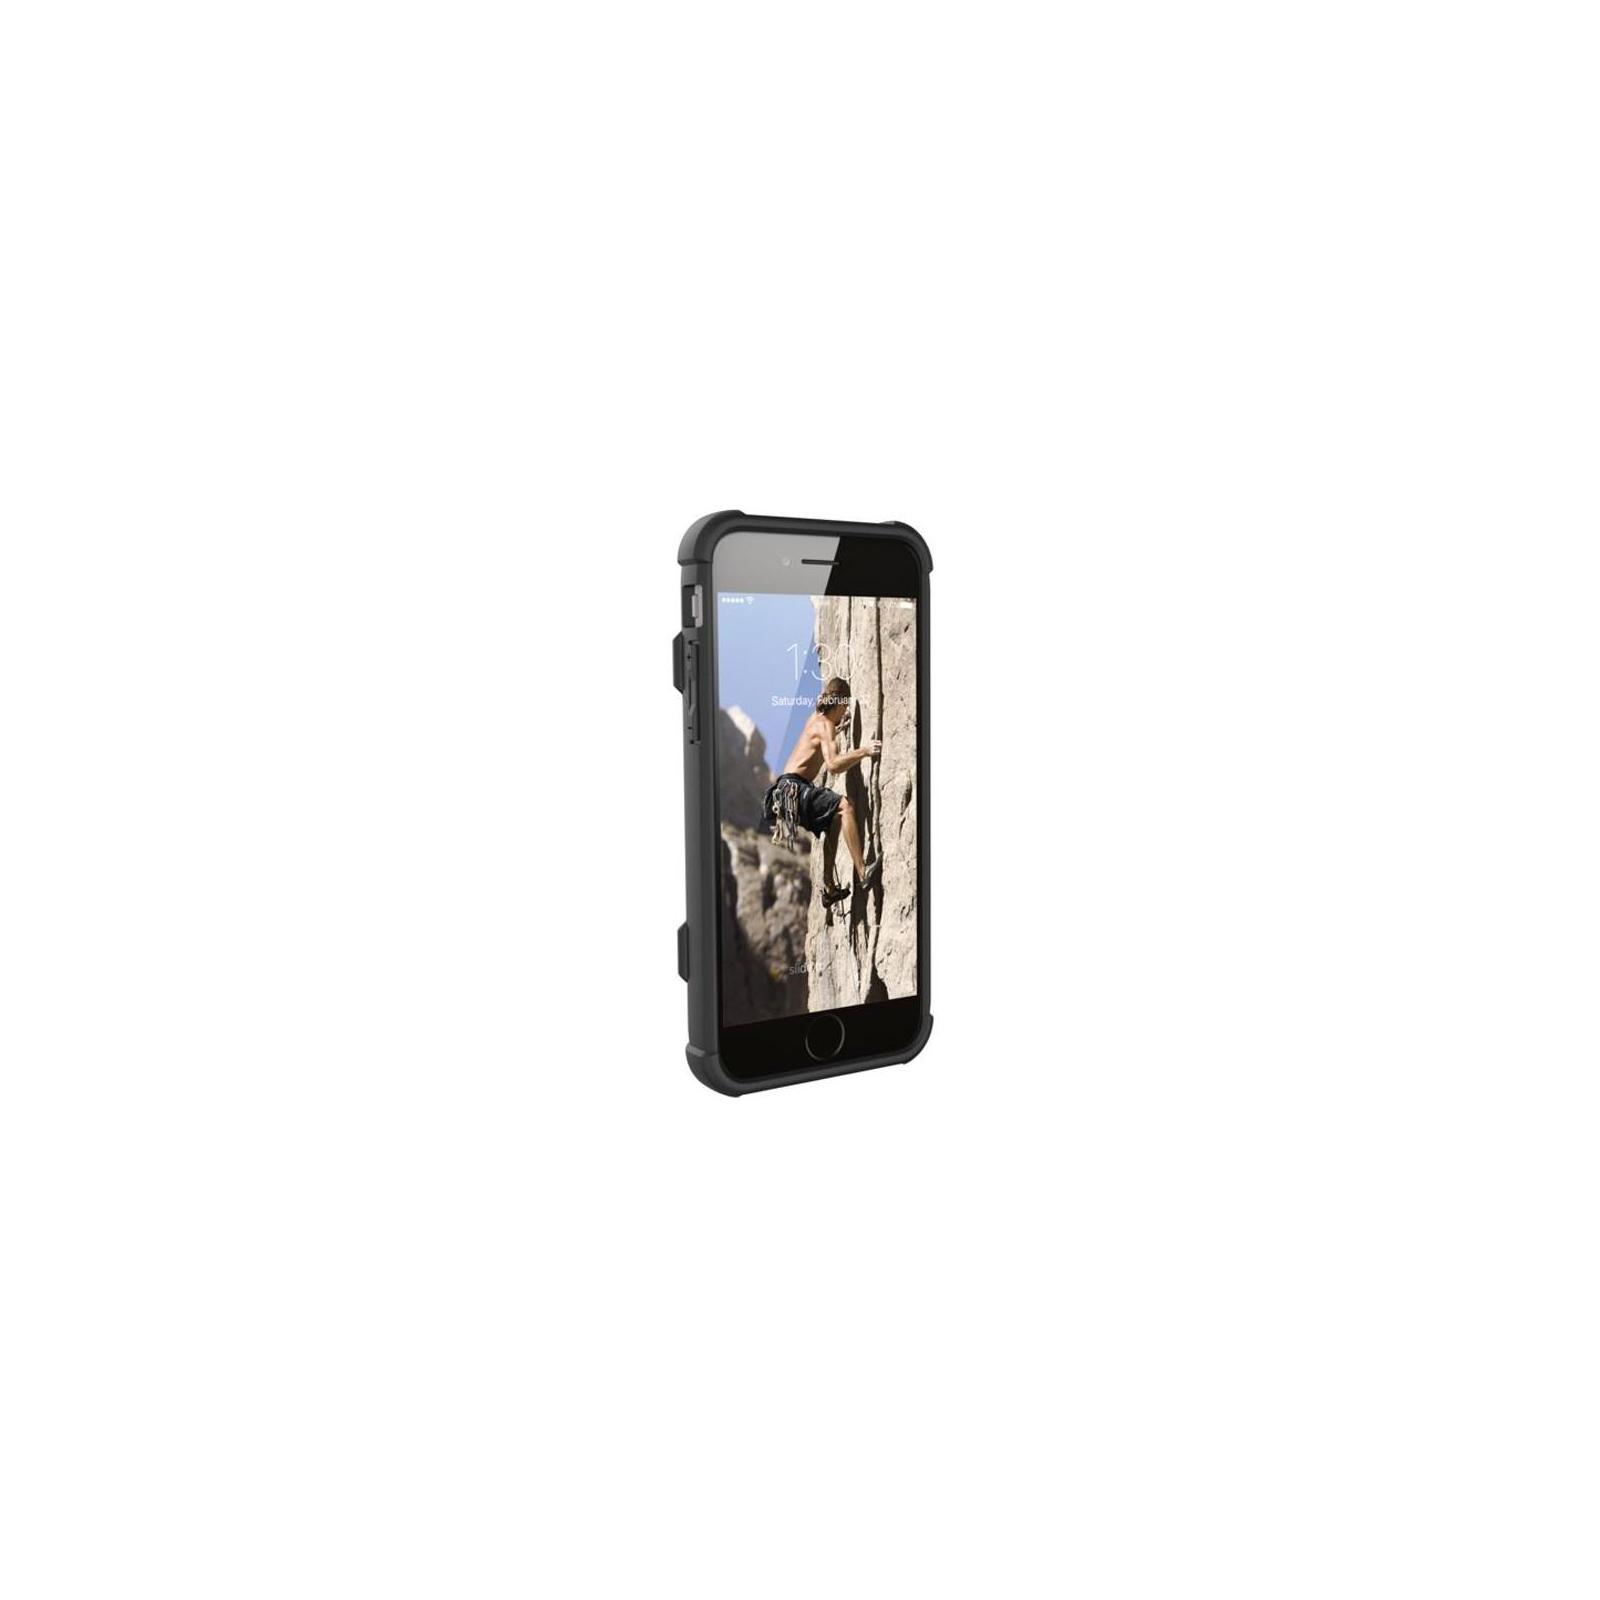 Чехол для моб. телефона Uag iPhone 8/7/6S/6 Trooper Case Black (IPH7/6S-T-BK) изображение 5